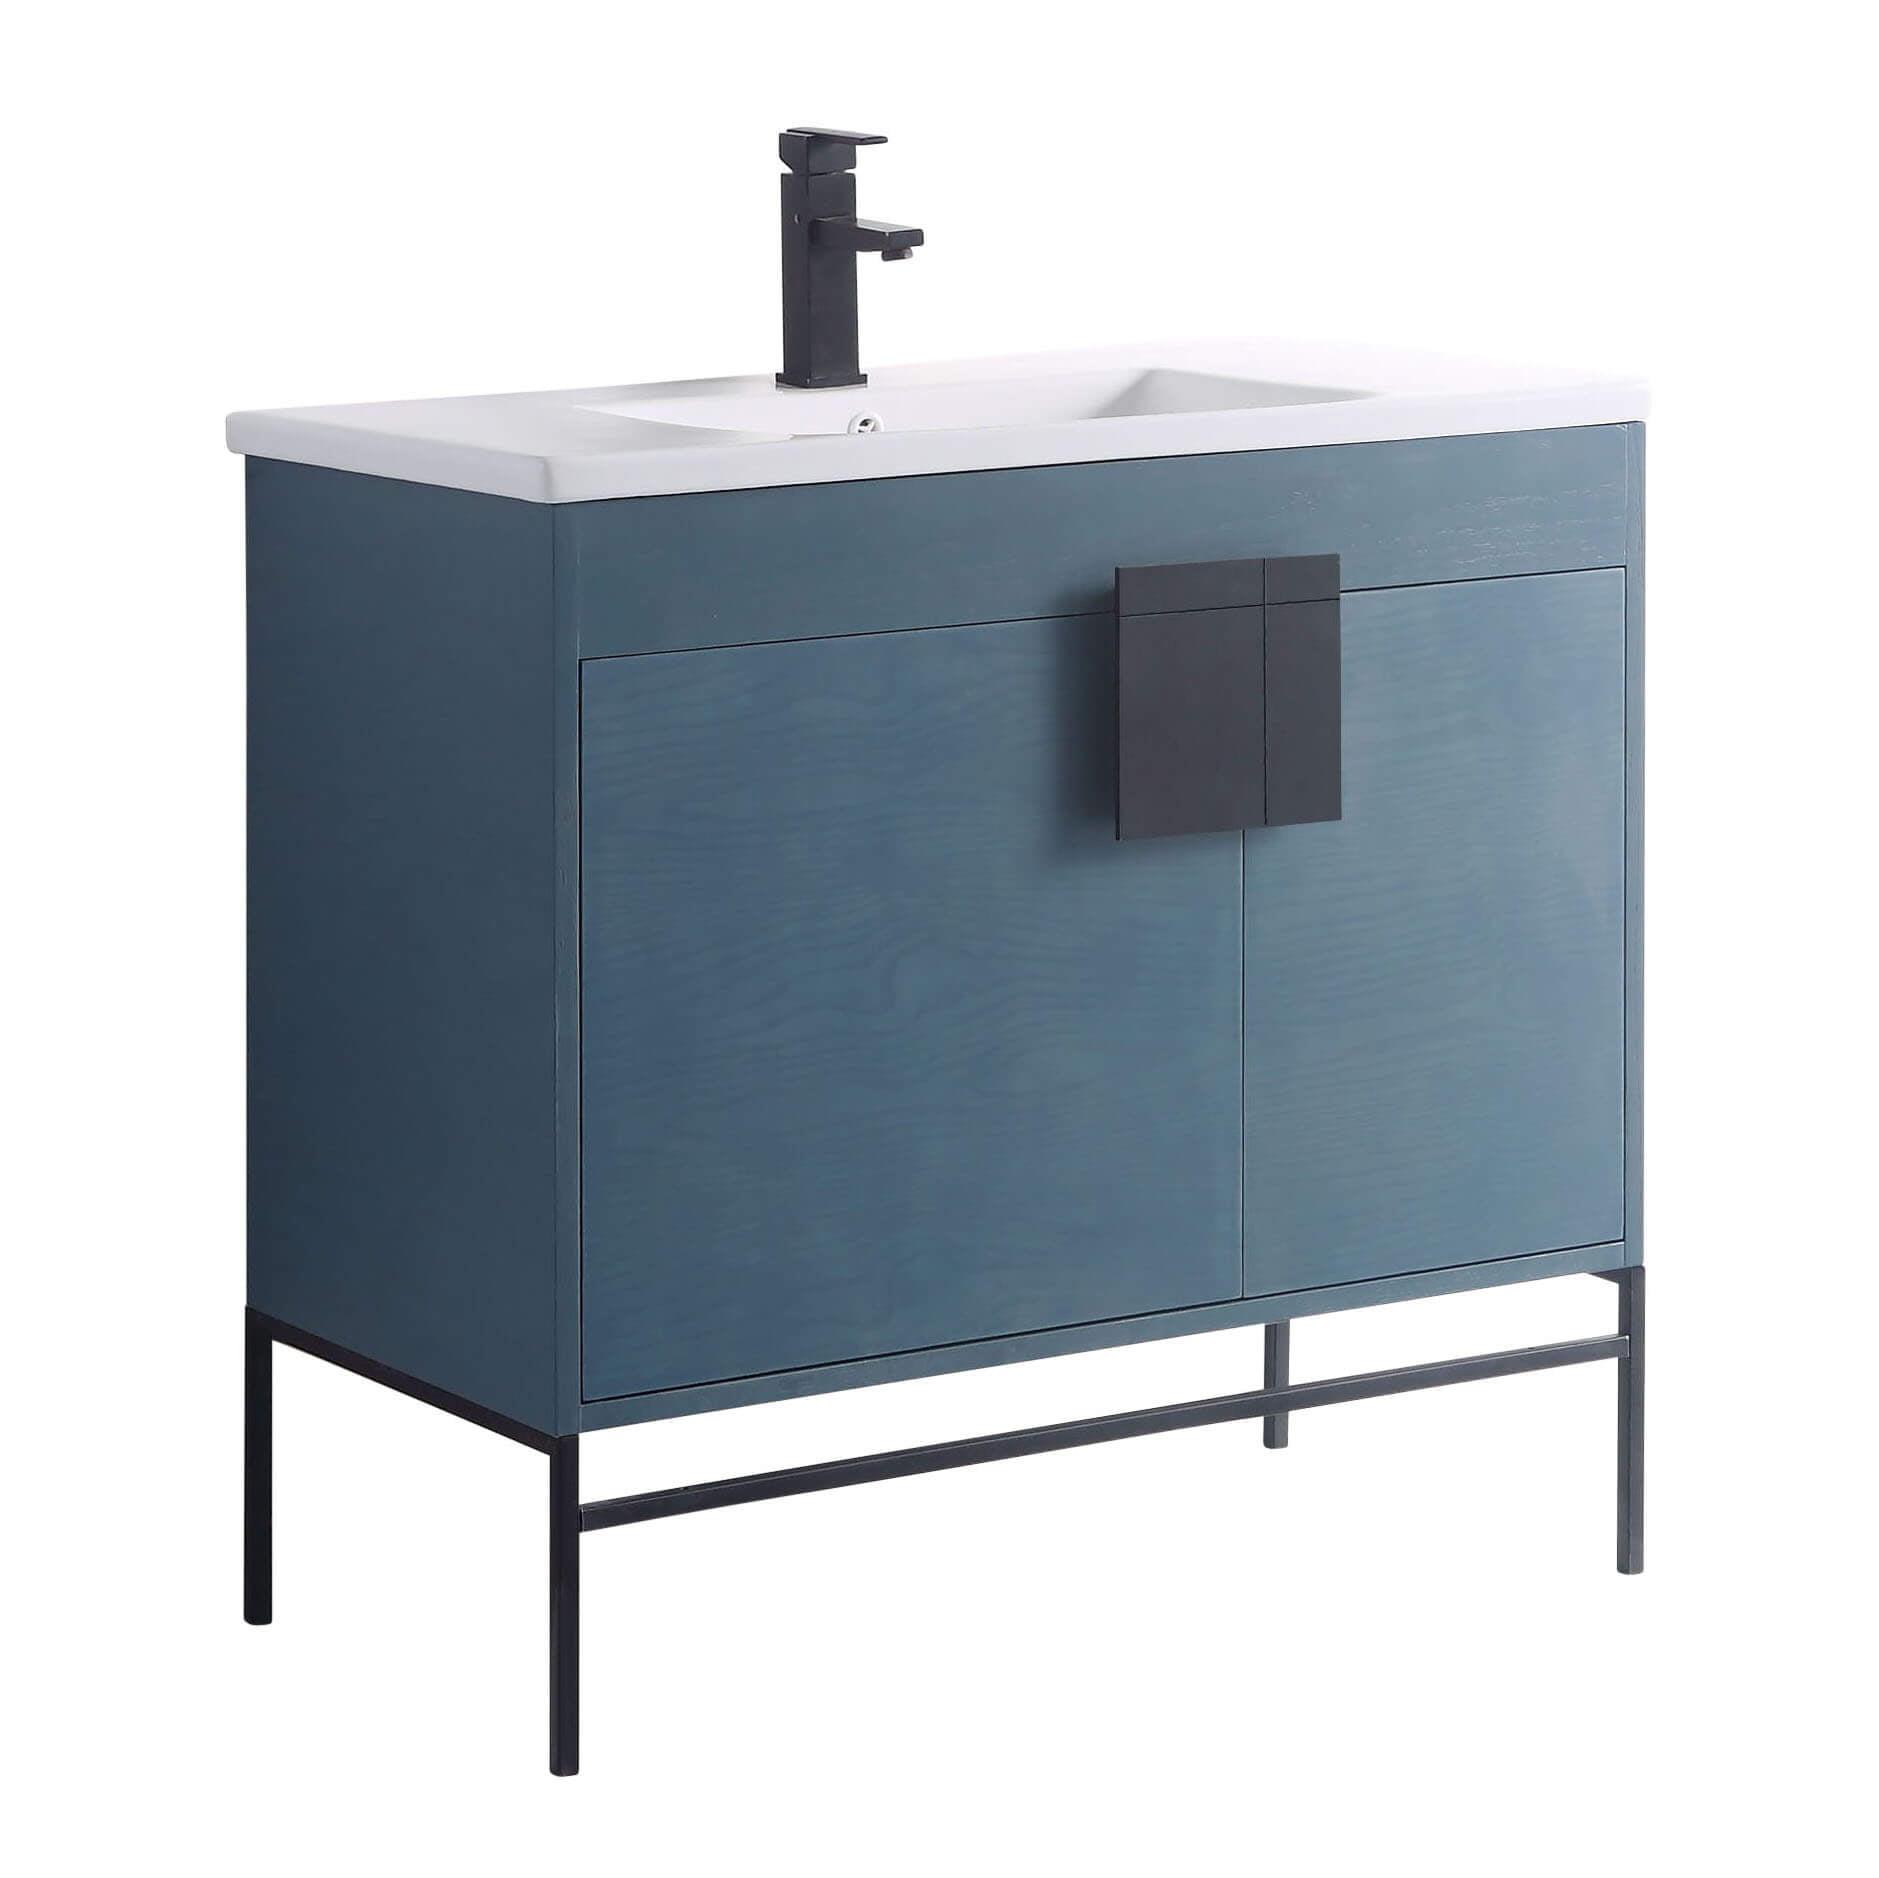 Fine Fixtures Modern Blue 36 Bathroom Vanity Set Black Matte Hardware Vitreous China Sink Top Walmart Com Walmart Com